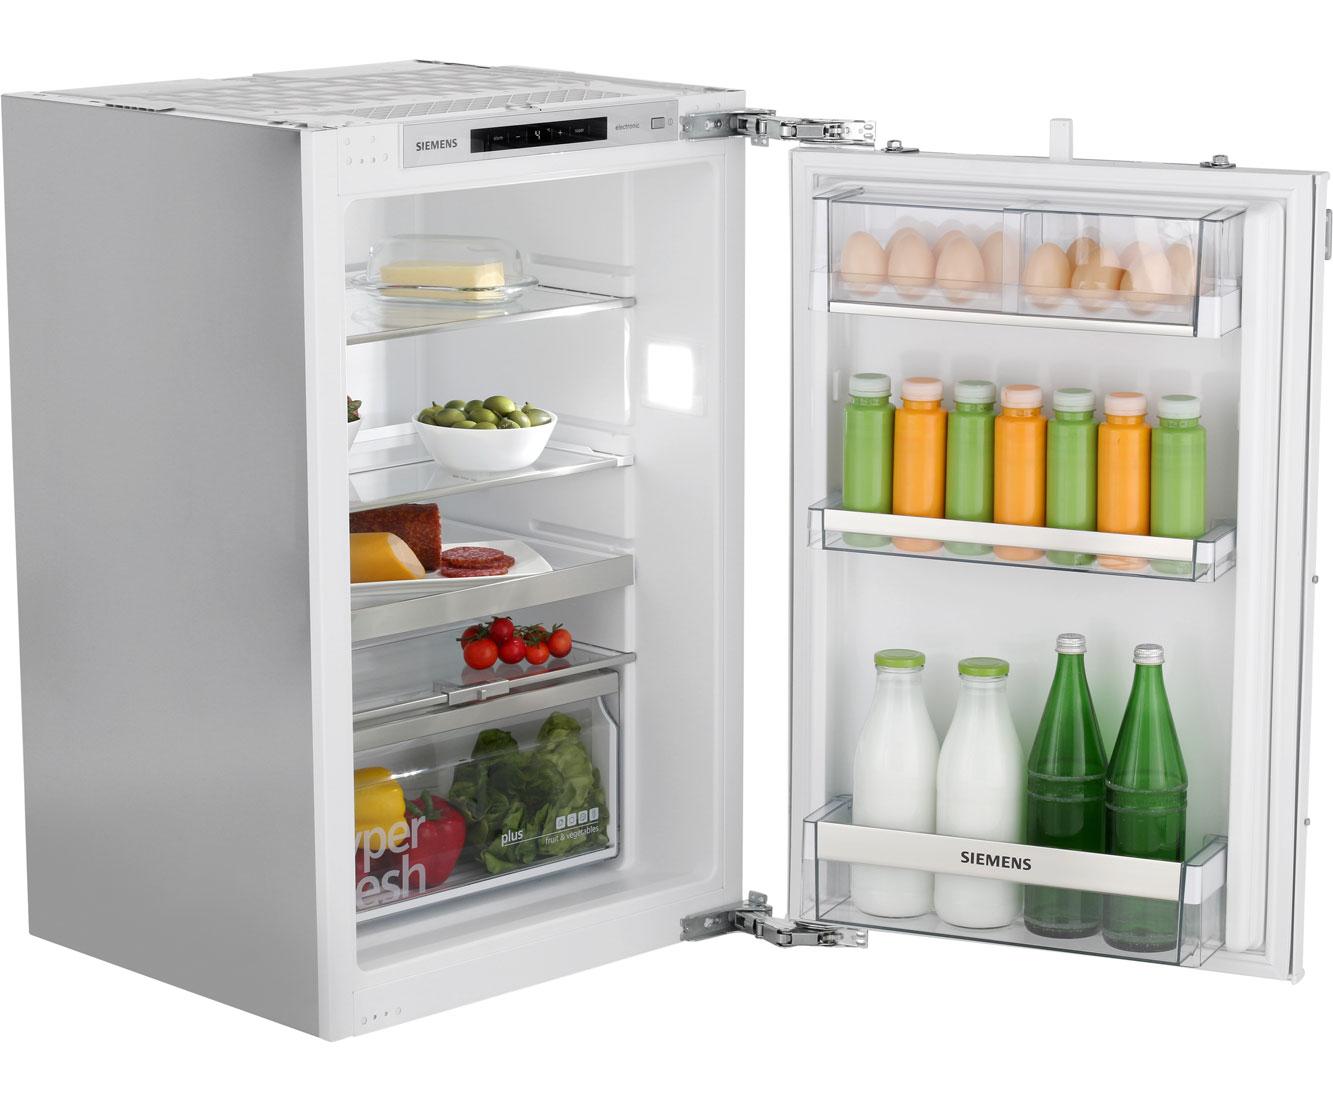 Kühlschrank Siemens : Siemens ki rad kühlschrank eingebaut cm weiß neu ebay